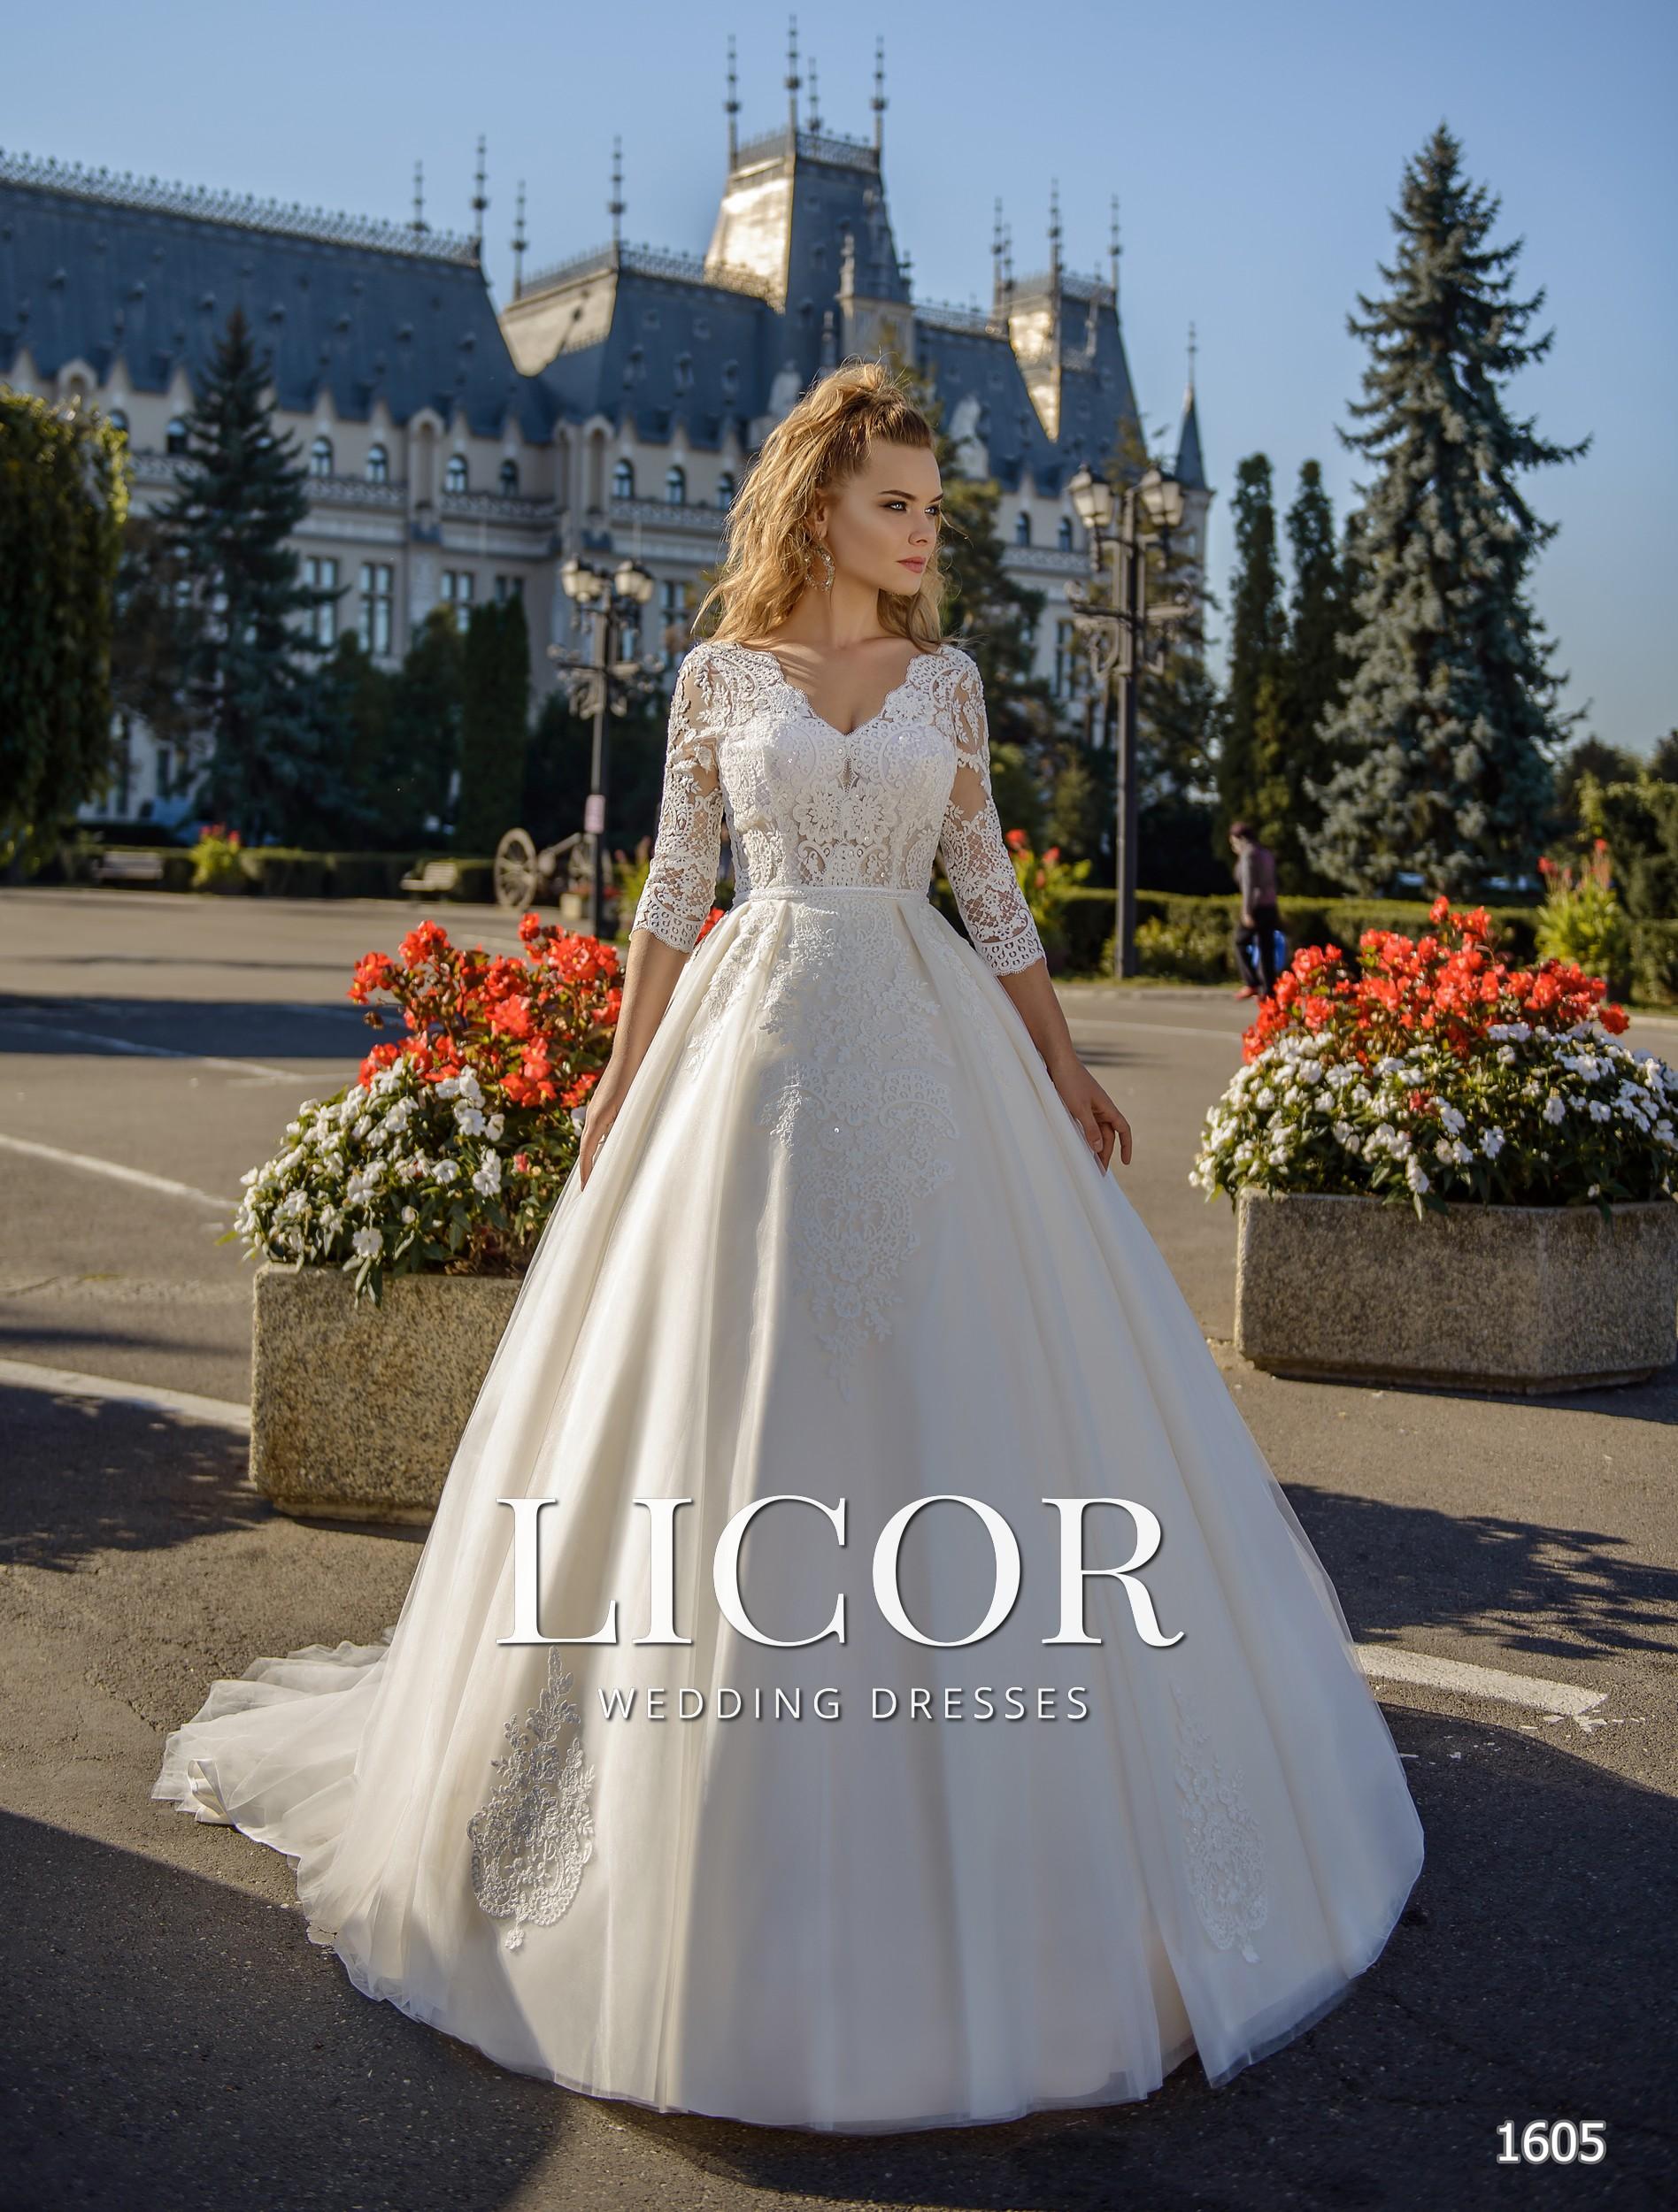 http://licor.com.ua/images/stories/virtuemart/product/1605(1).jpg